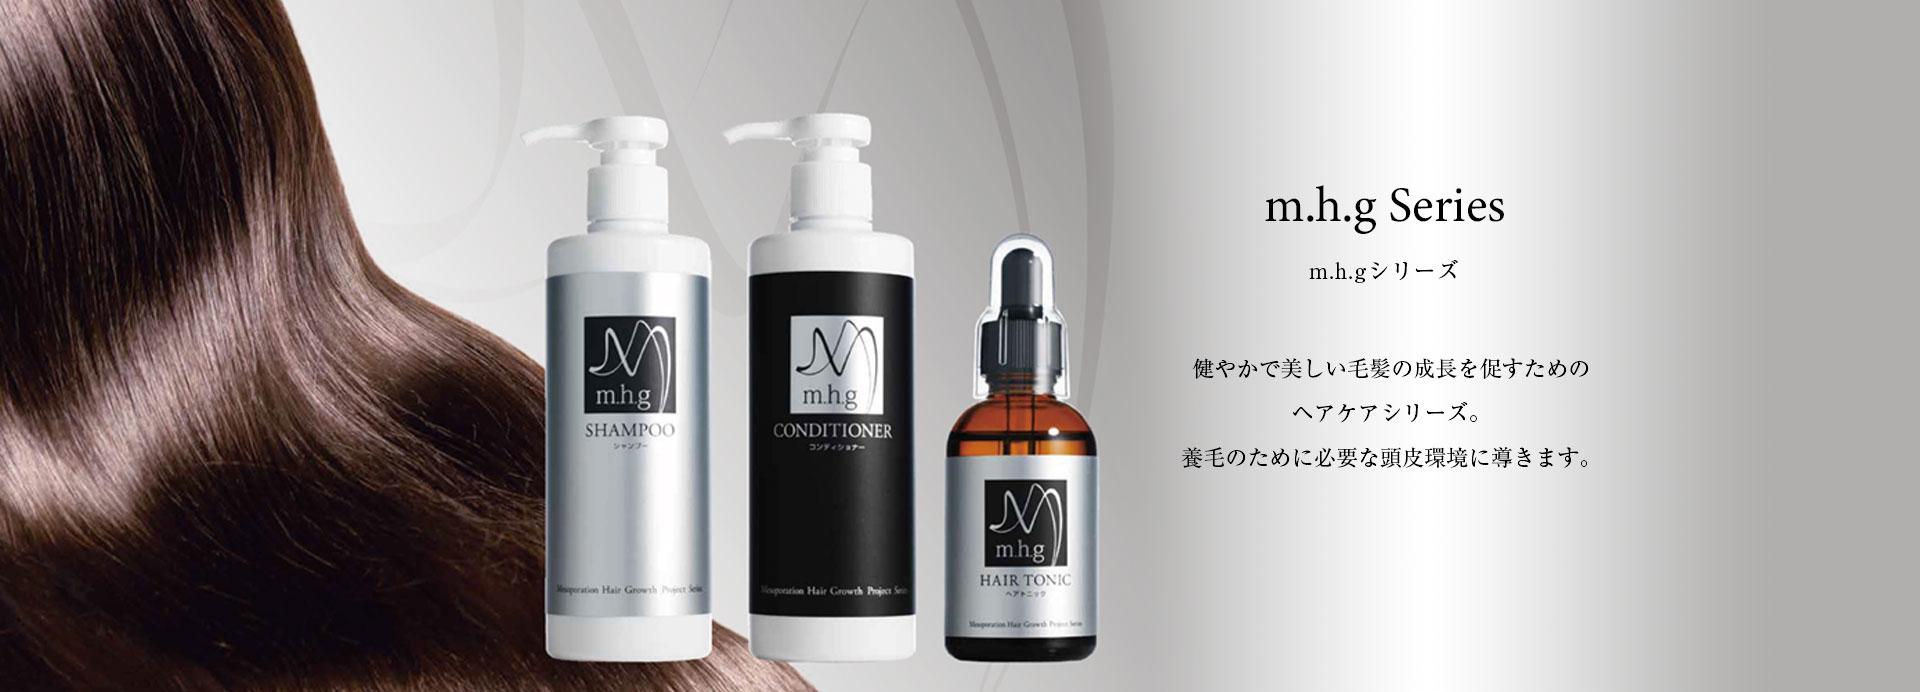 m.h.g Series m.h.gシリーズ